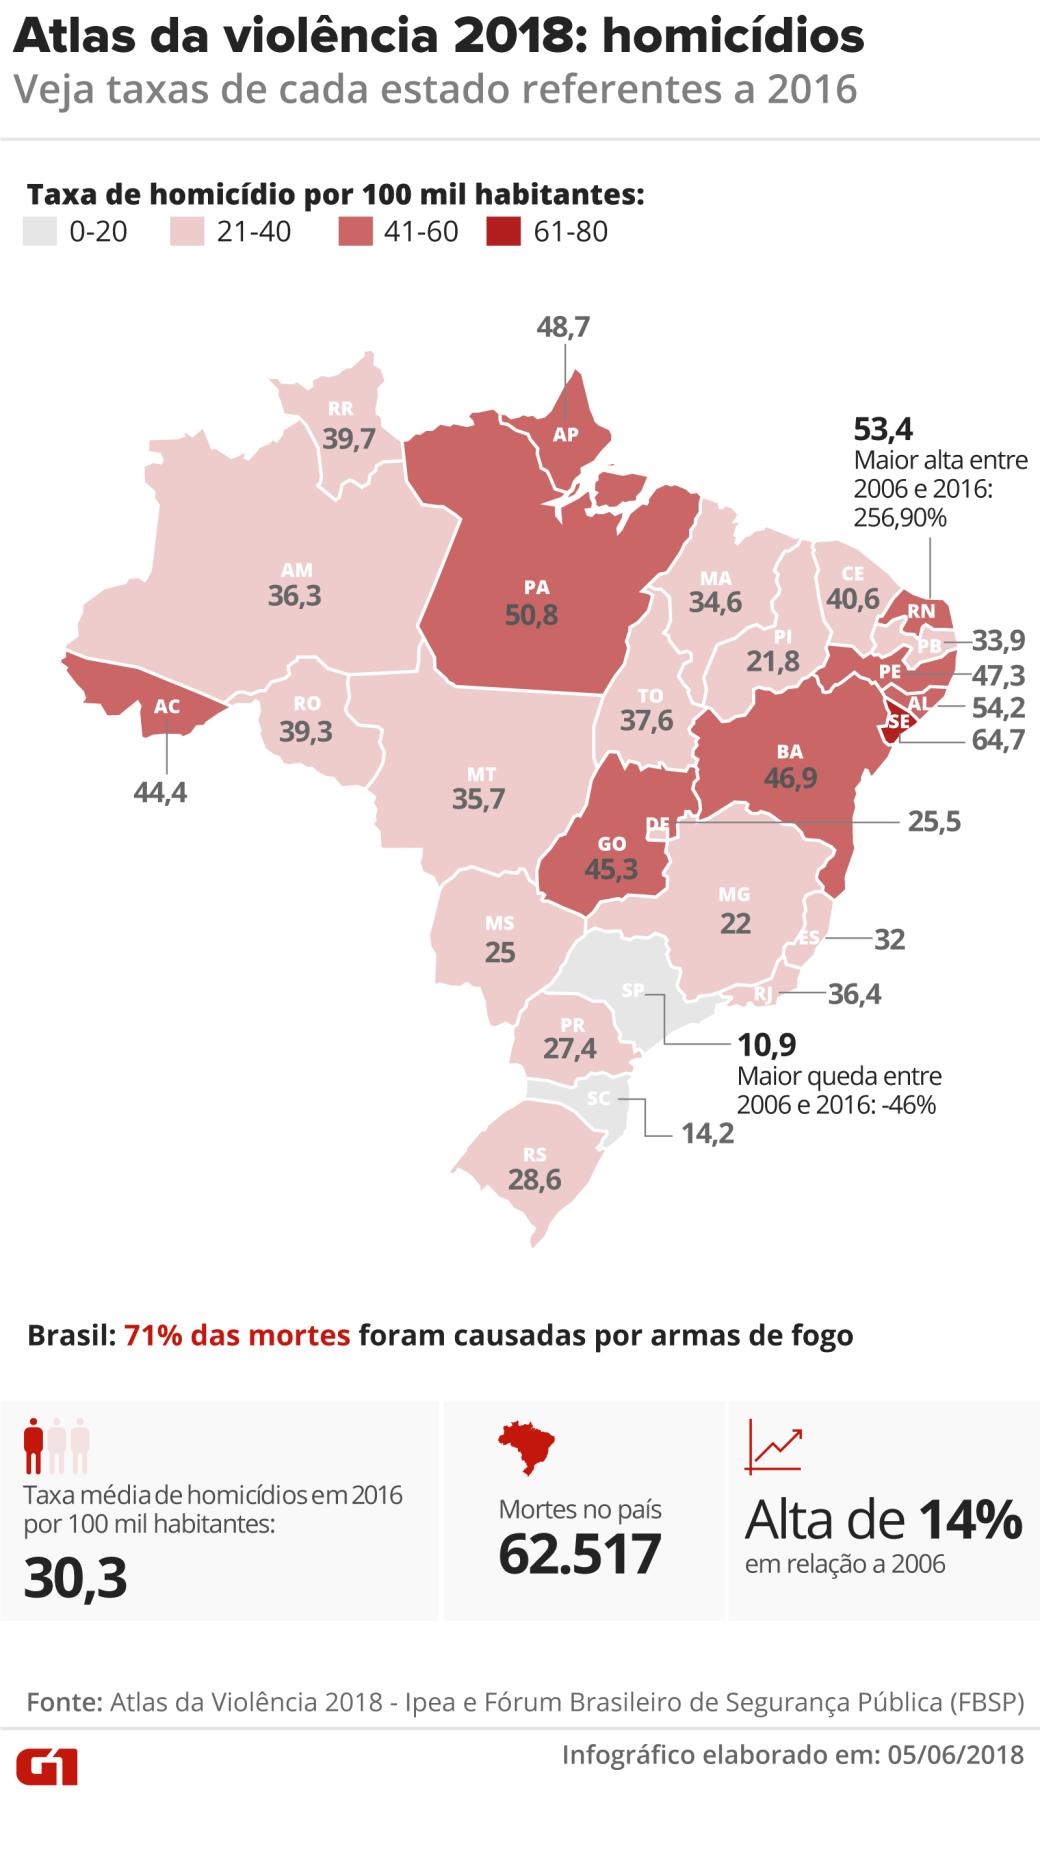 atlas-violencia-taxas-homicidio-v2.png